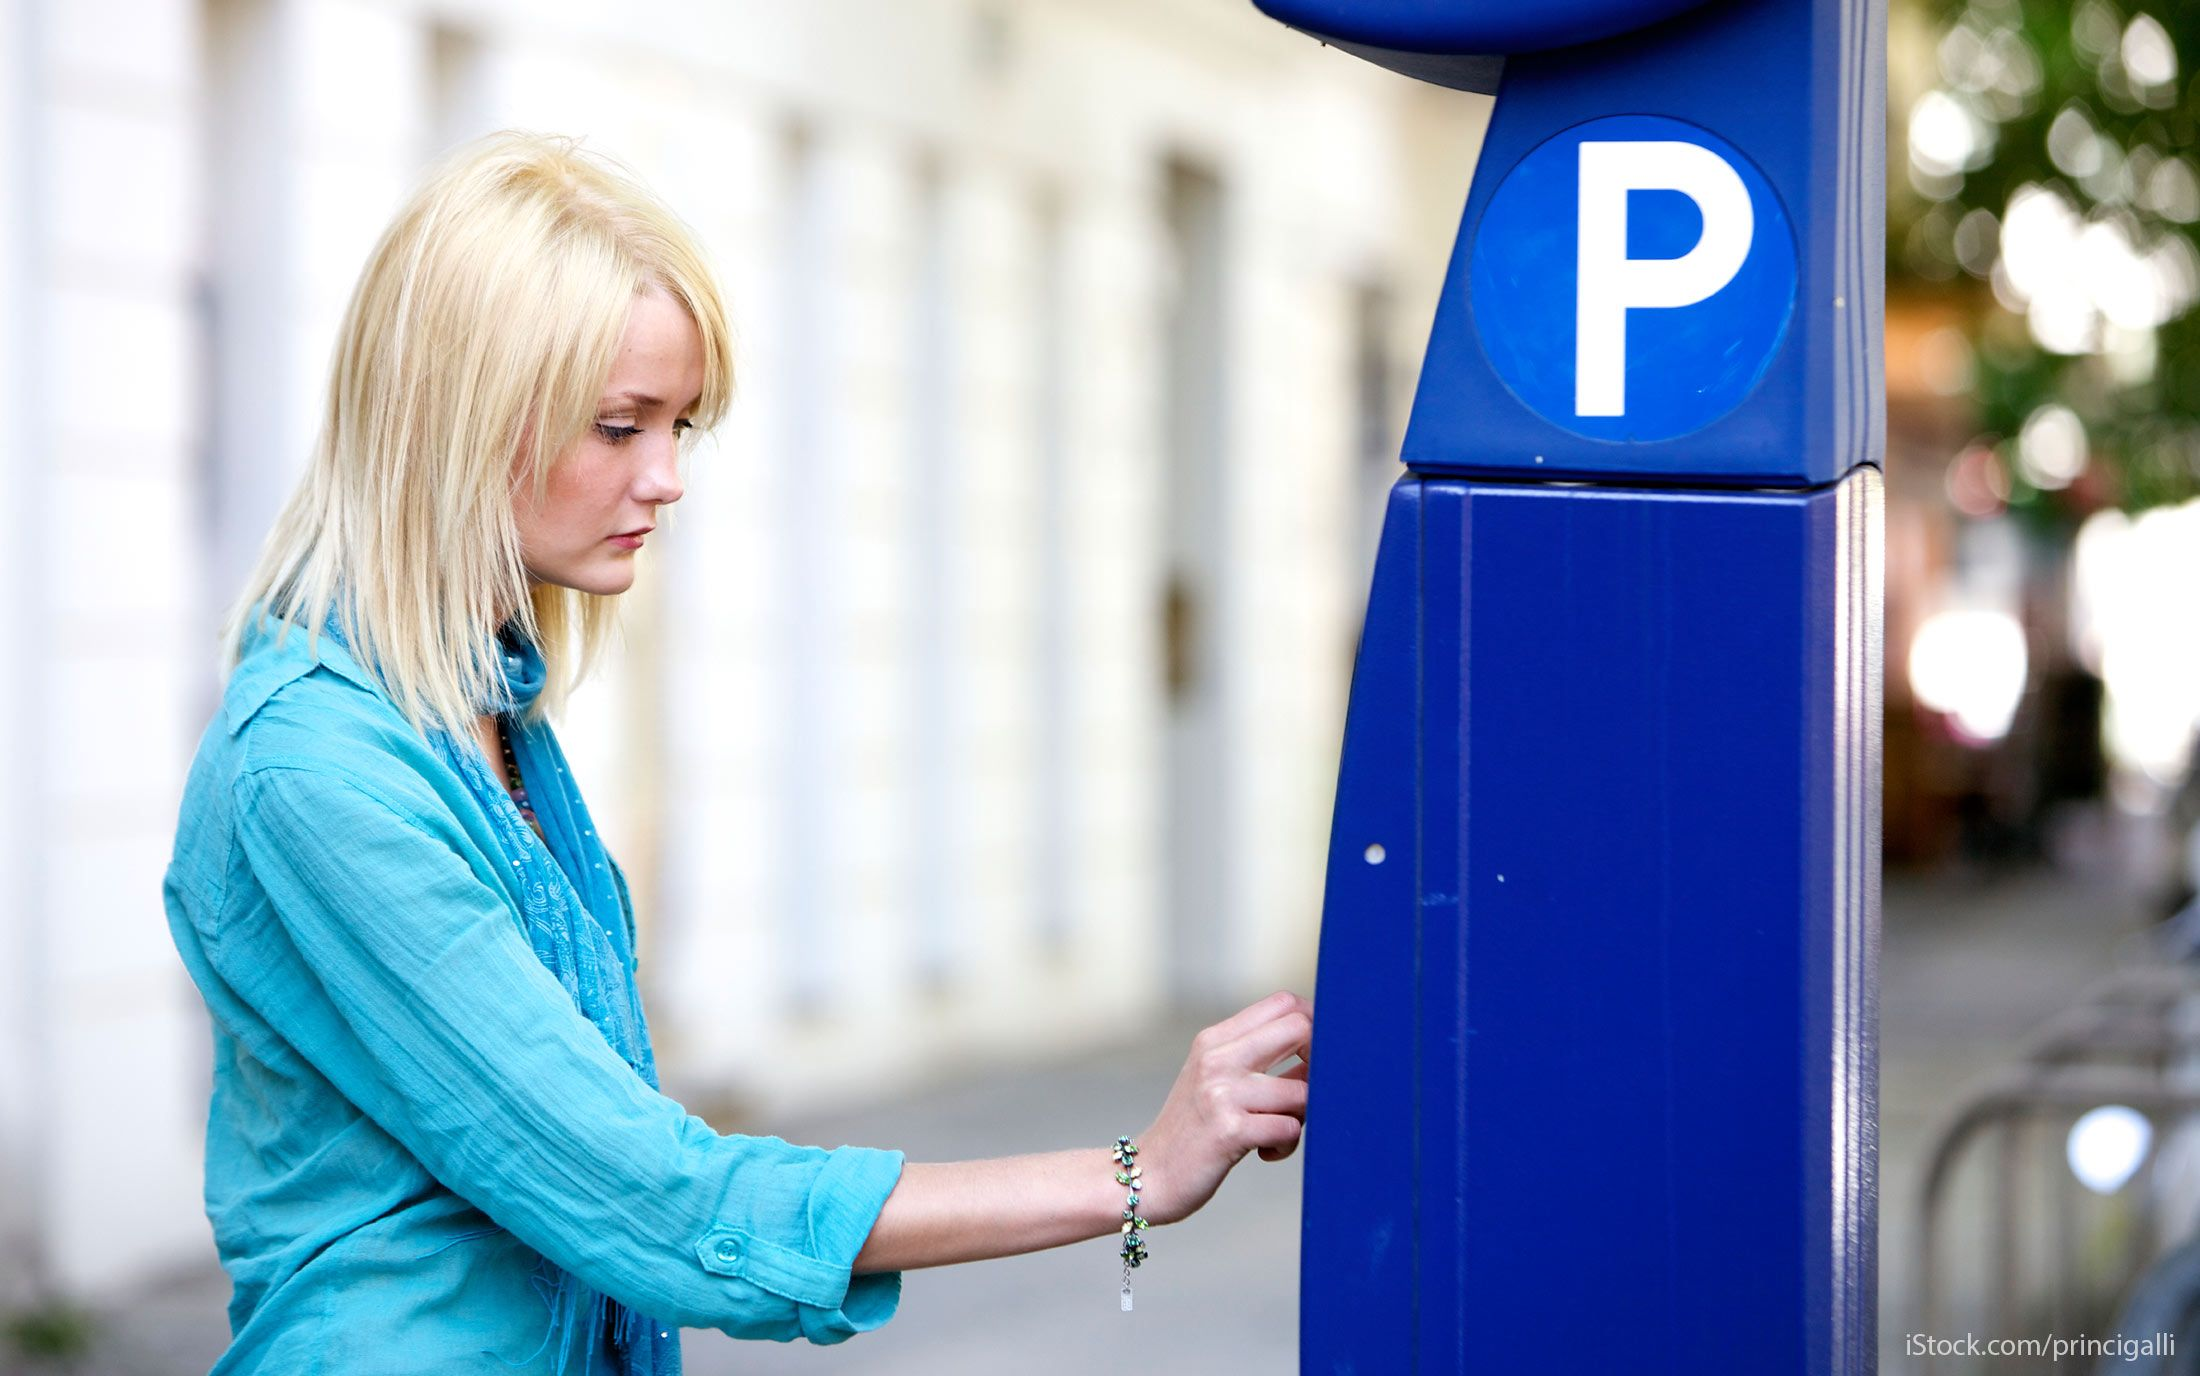 cashless parking meters